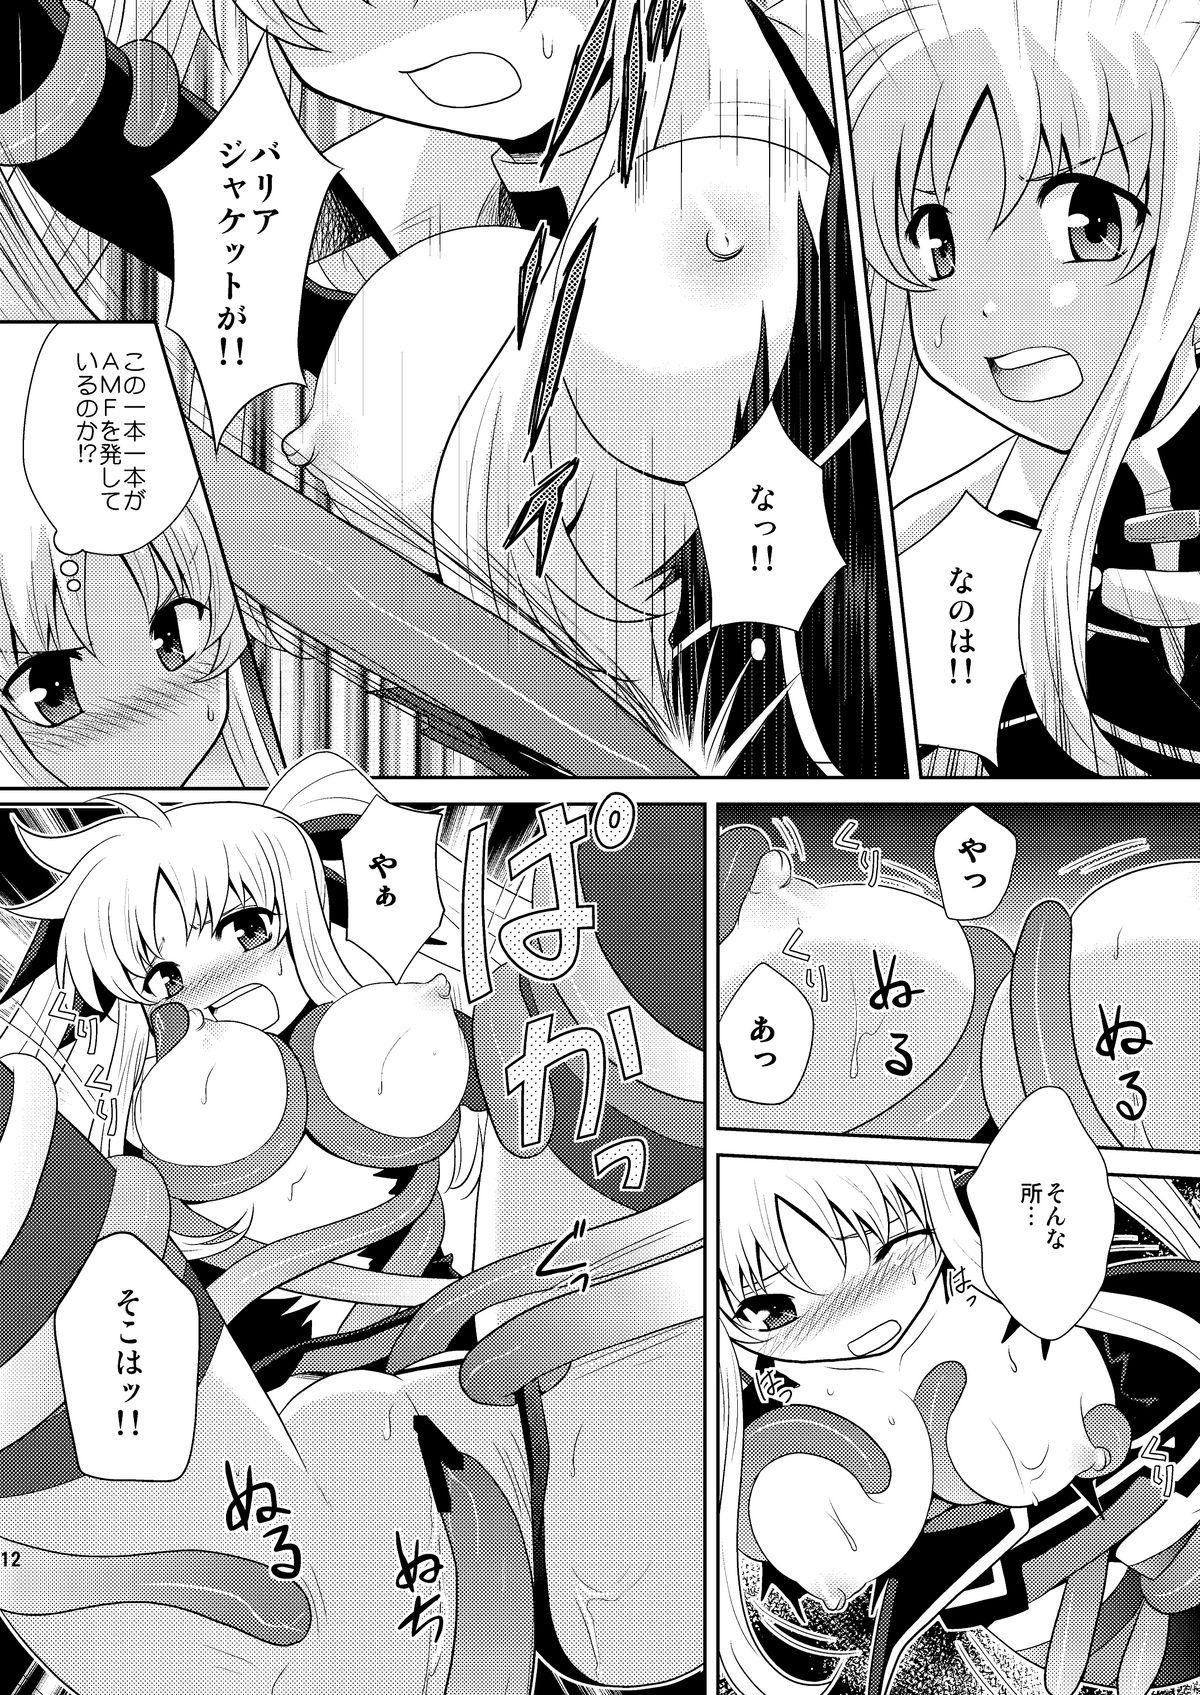 W Fate-san 11